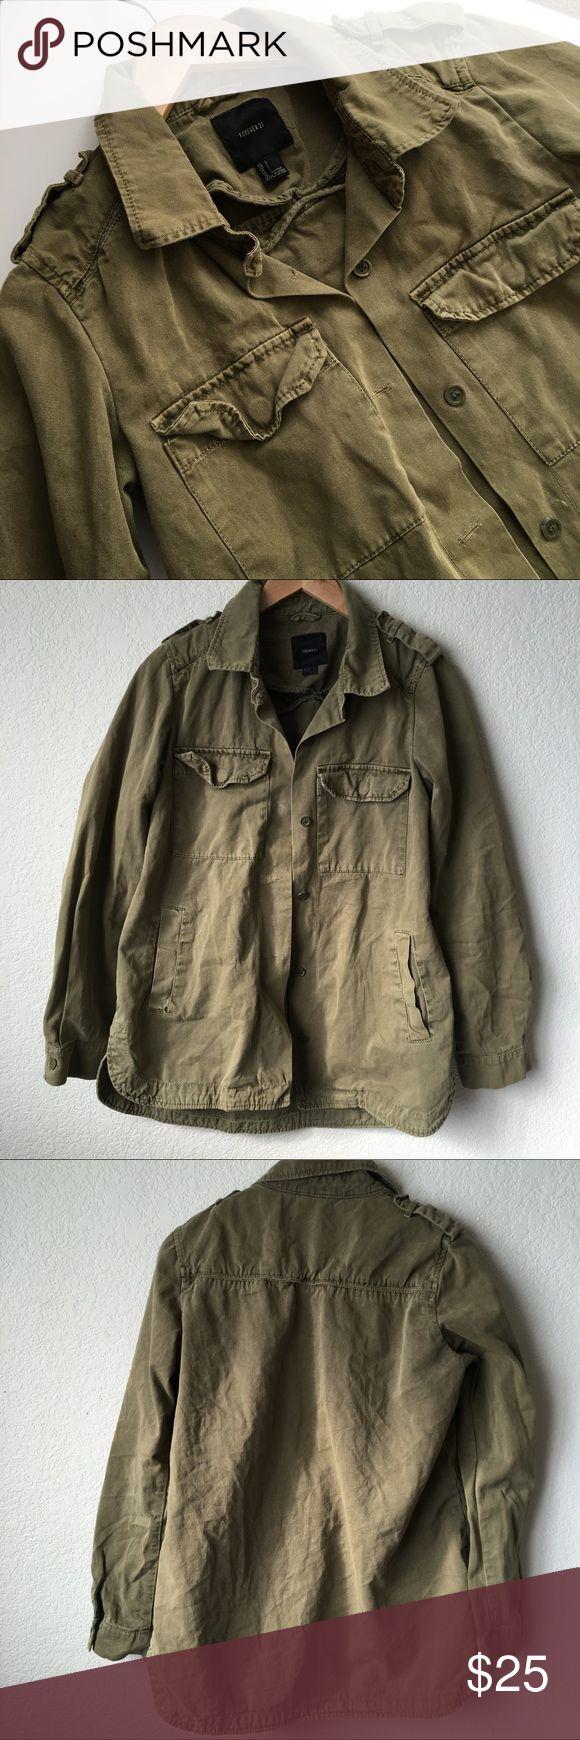 Military Style Shirt Jacket Olive Military Style jacket. Shirt tail hem and pockets. Good condition. Forever 21 Jackets & Coats